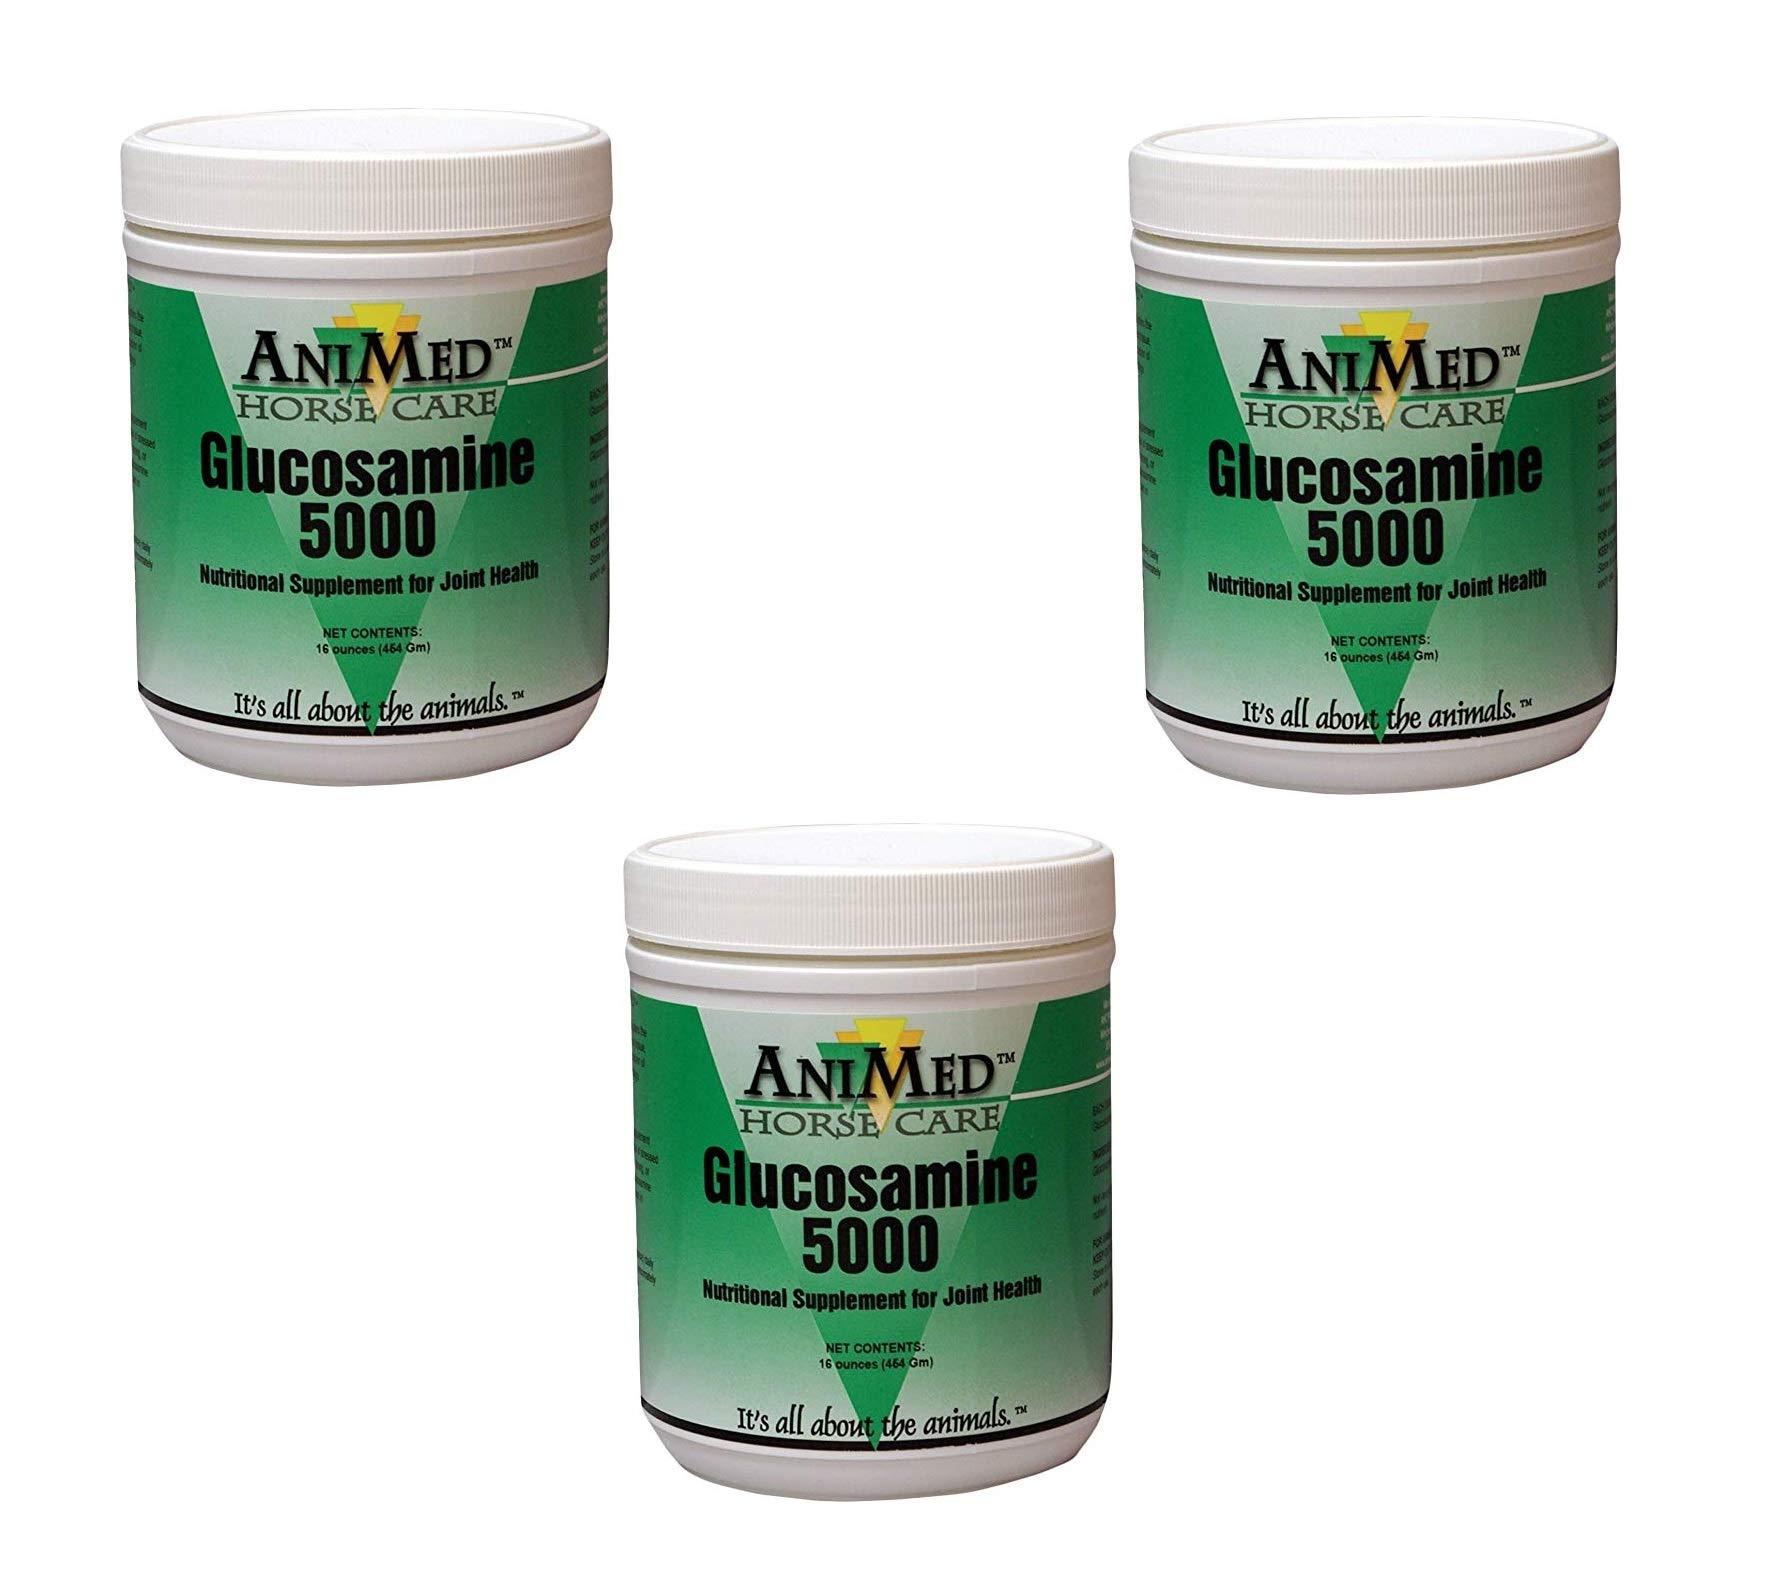 AniMed Horse Glucosamine 5000 Supplement, 16 oz (3 Pack)